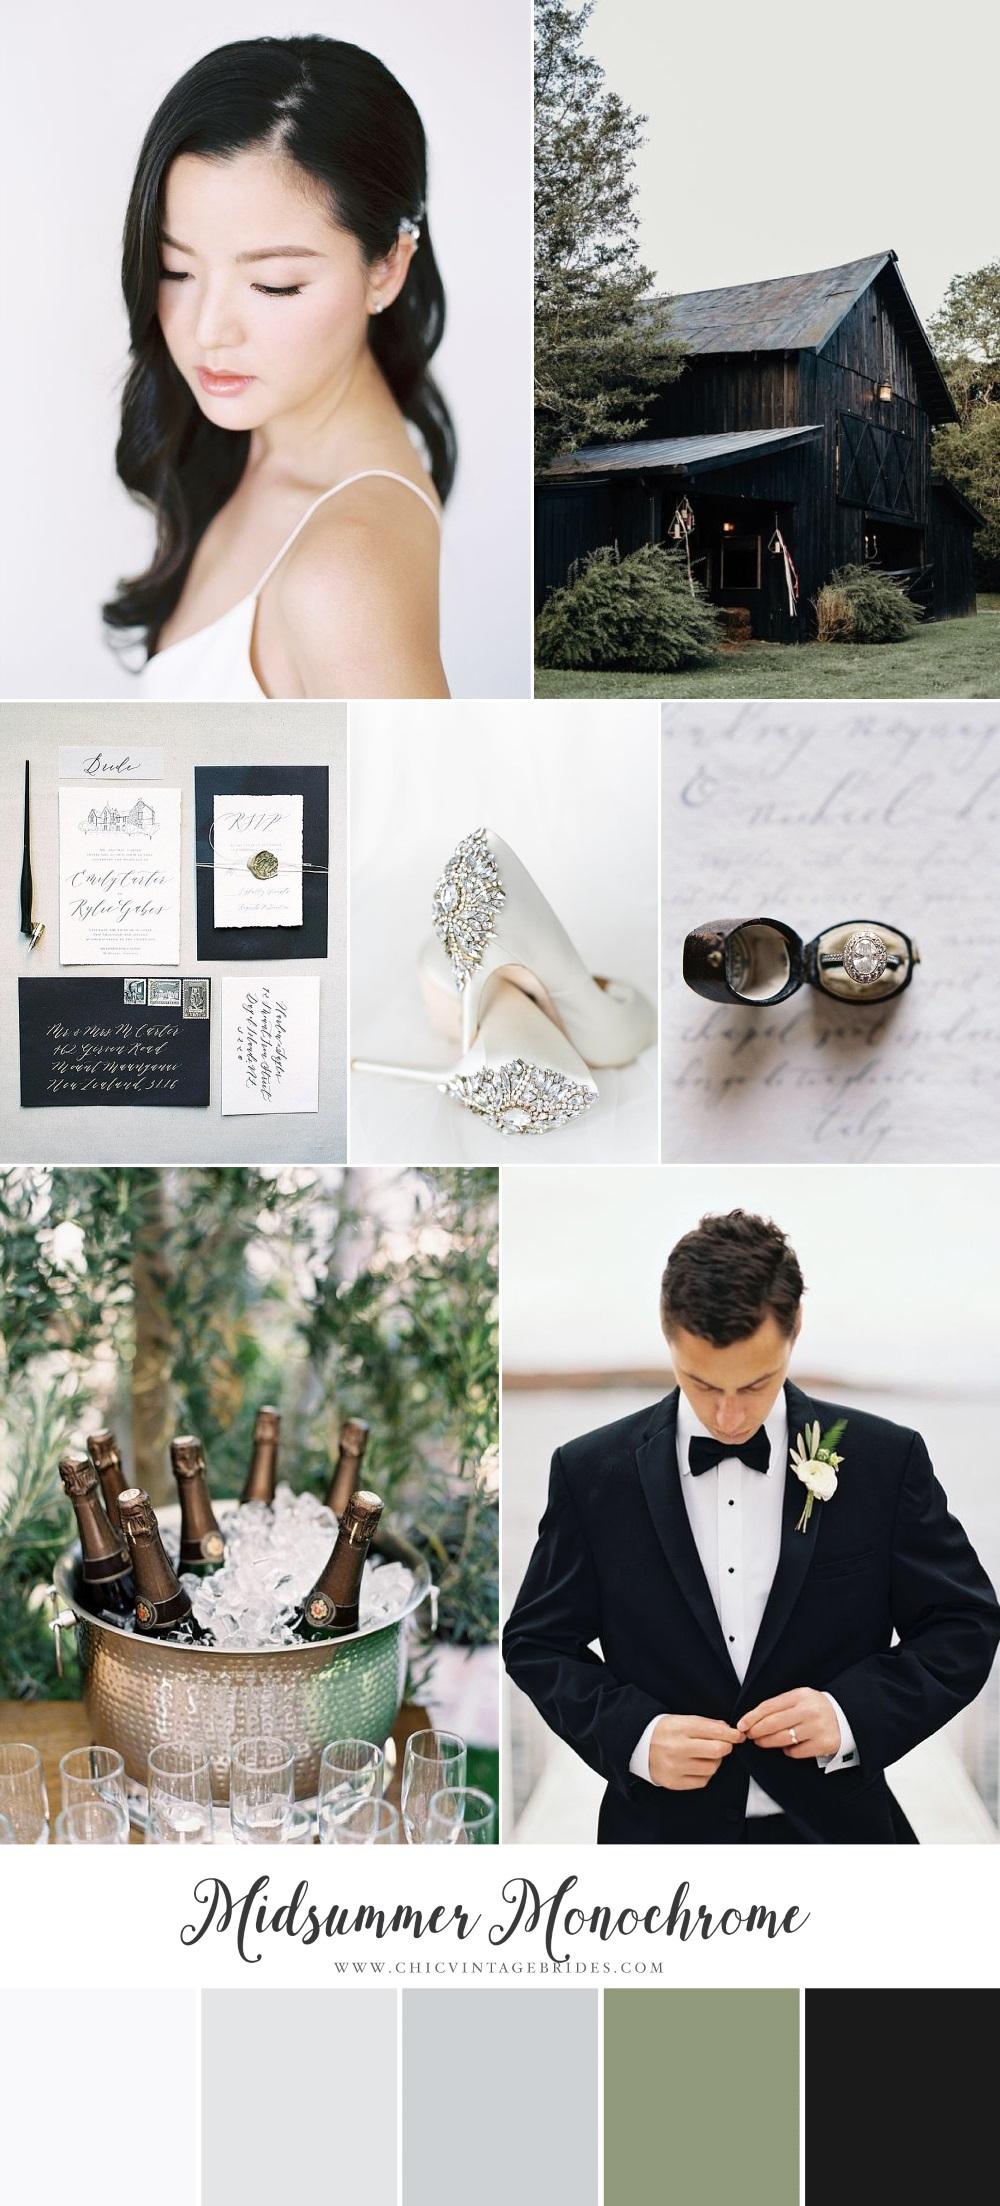 Midsummer Monochrome Wedding Inspiration Boar